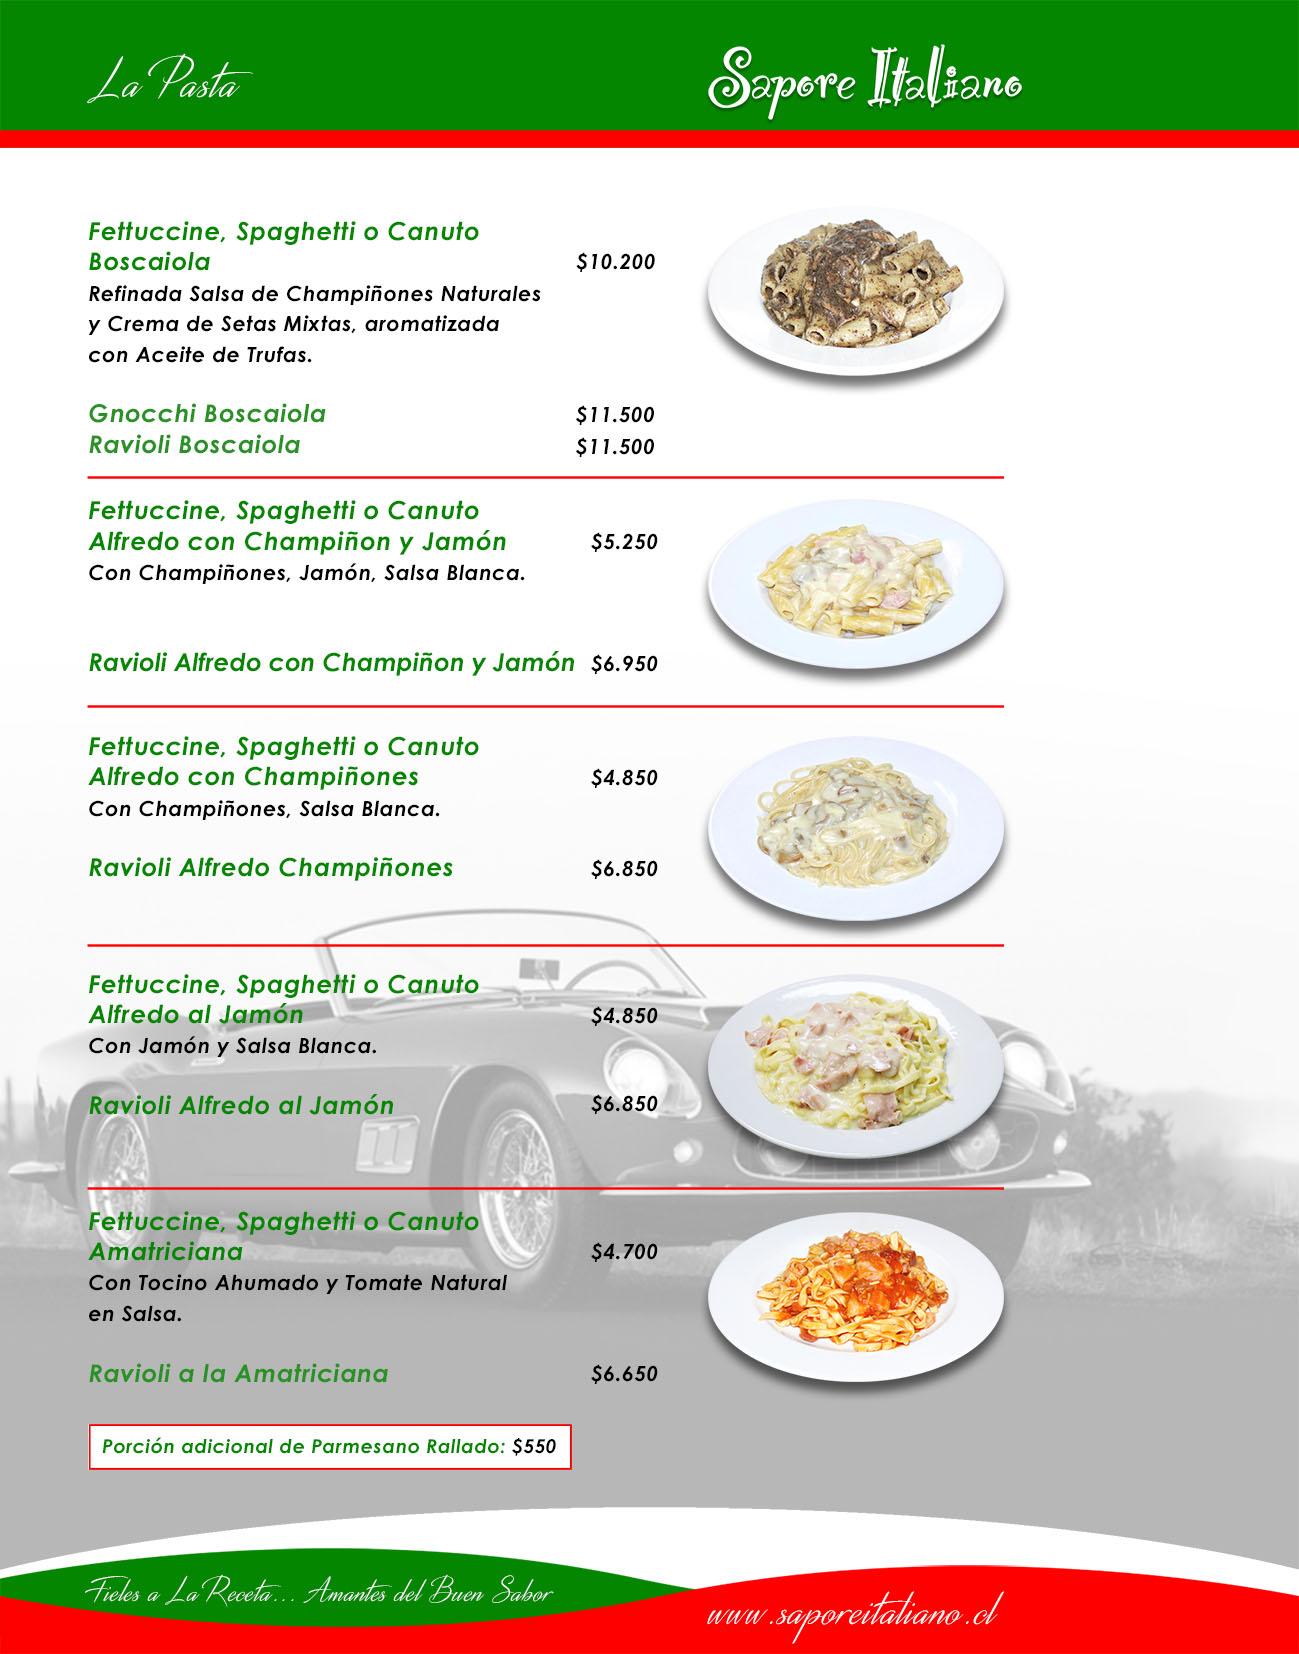 Sapore Italiano - Fieles a la Receta ... Amantes del buen sabor